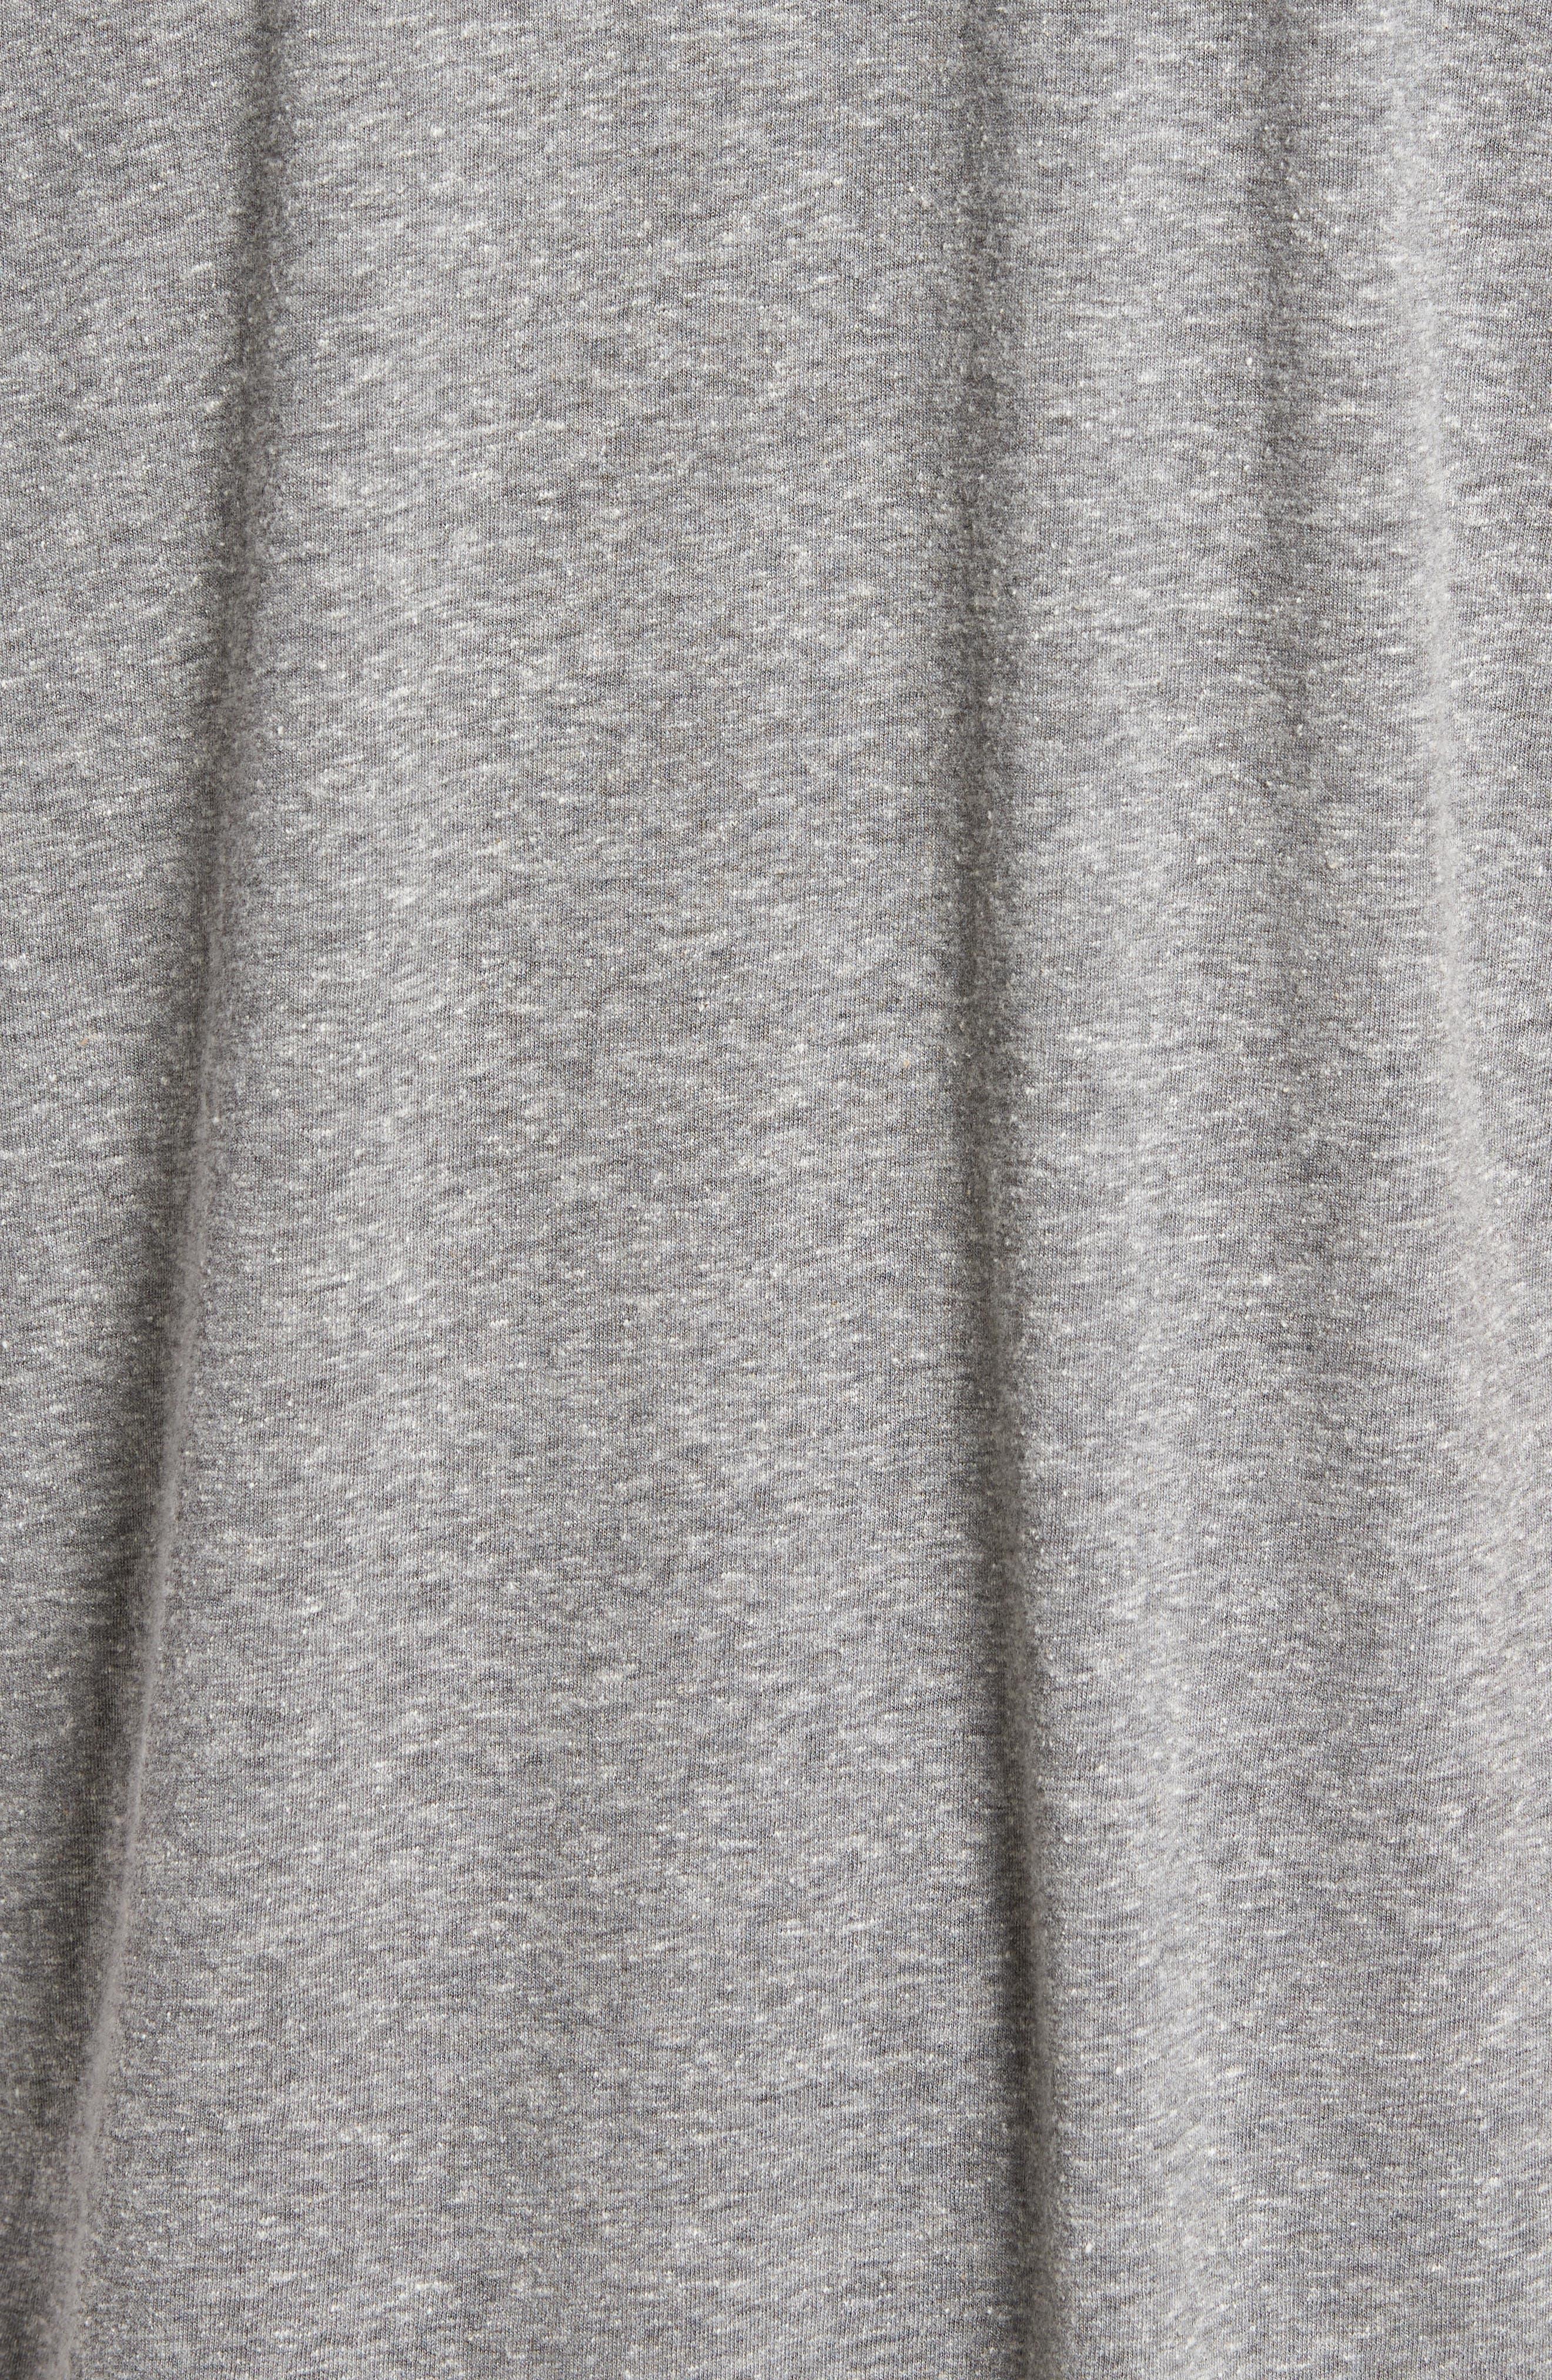 RETRO BRAND,                             Original Retro Brand Silver Bullet Graphic T-Shirt,                             Alternate thumbnail 5, color,                             020